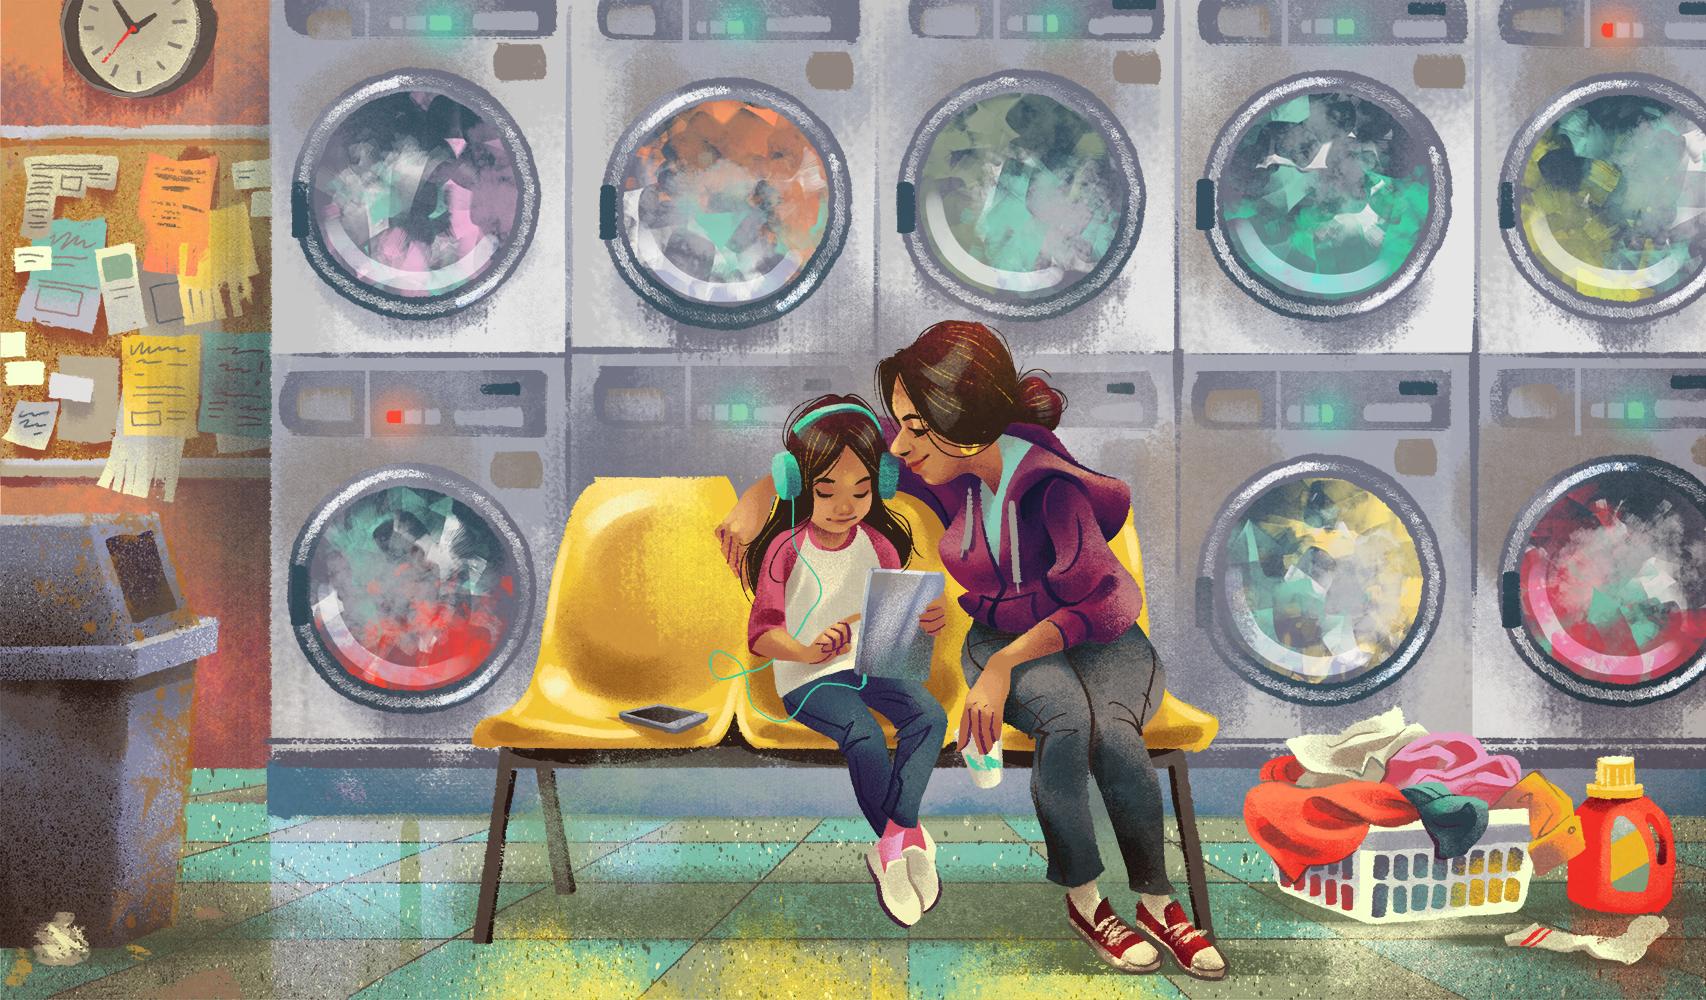 laundromat 4 Valerie Valdivia.png